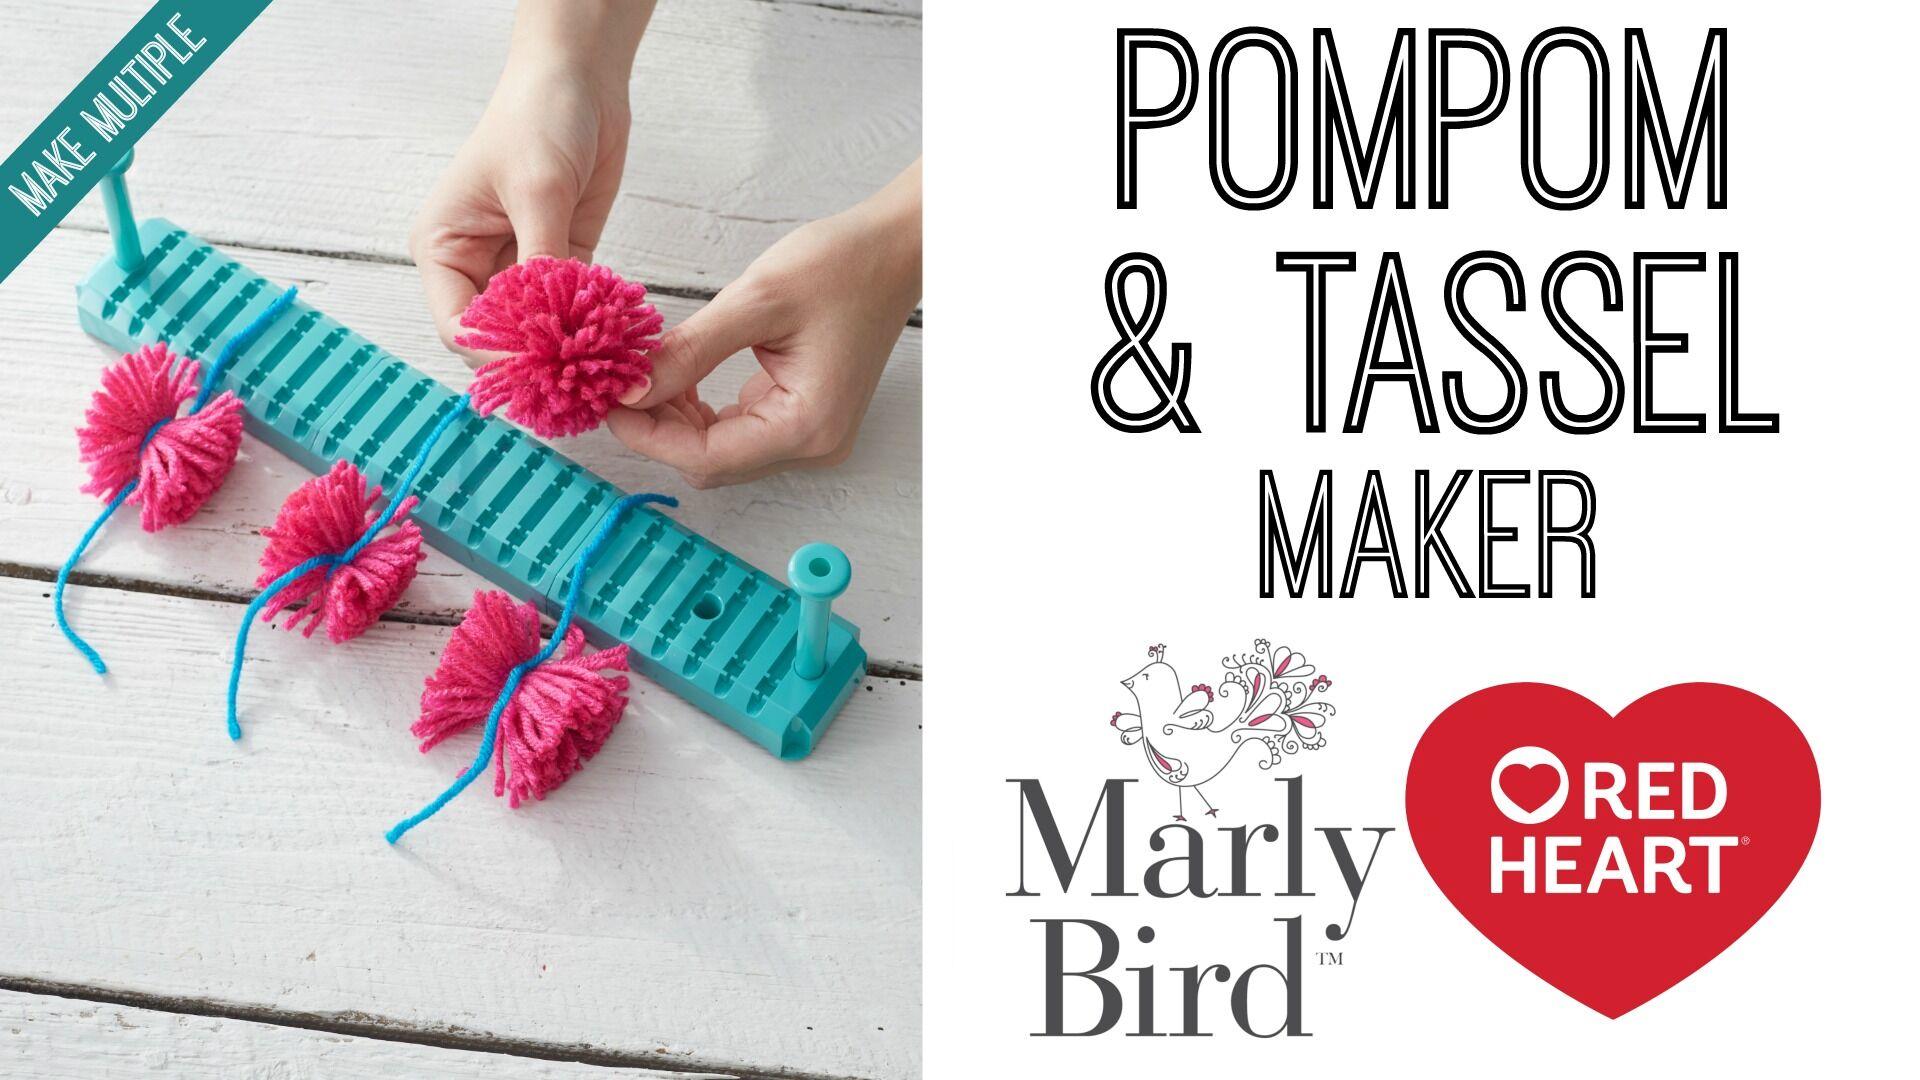 How to Make a Pompom and Tassel